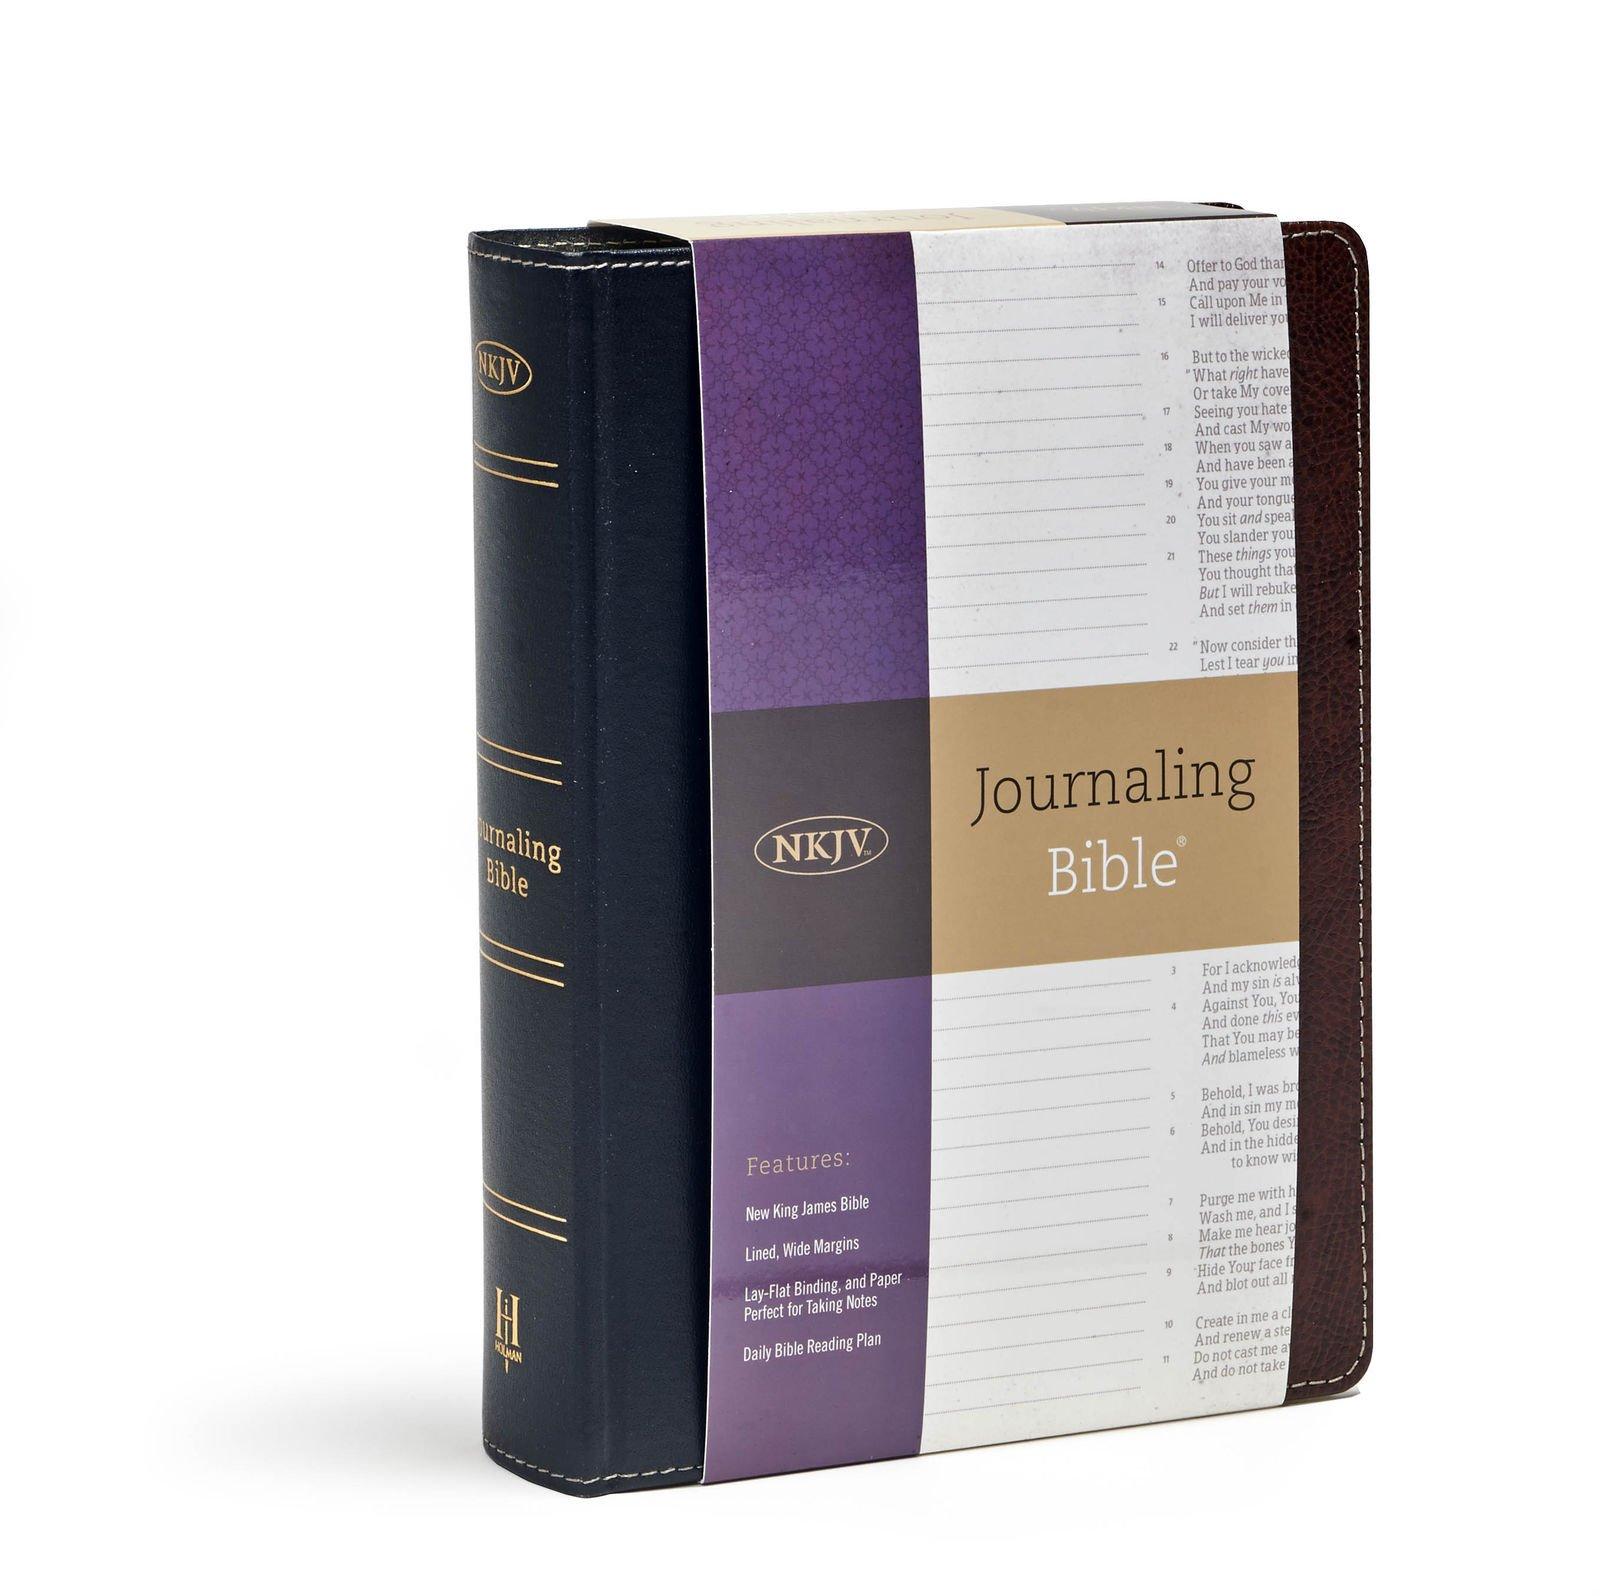 Nkjv Journaling Bible�: Holman Bible Staff: 9781433691584: Amazon: Books